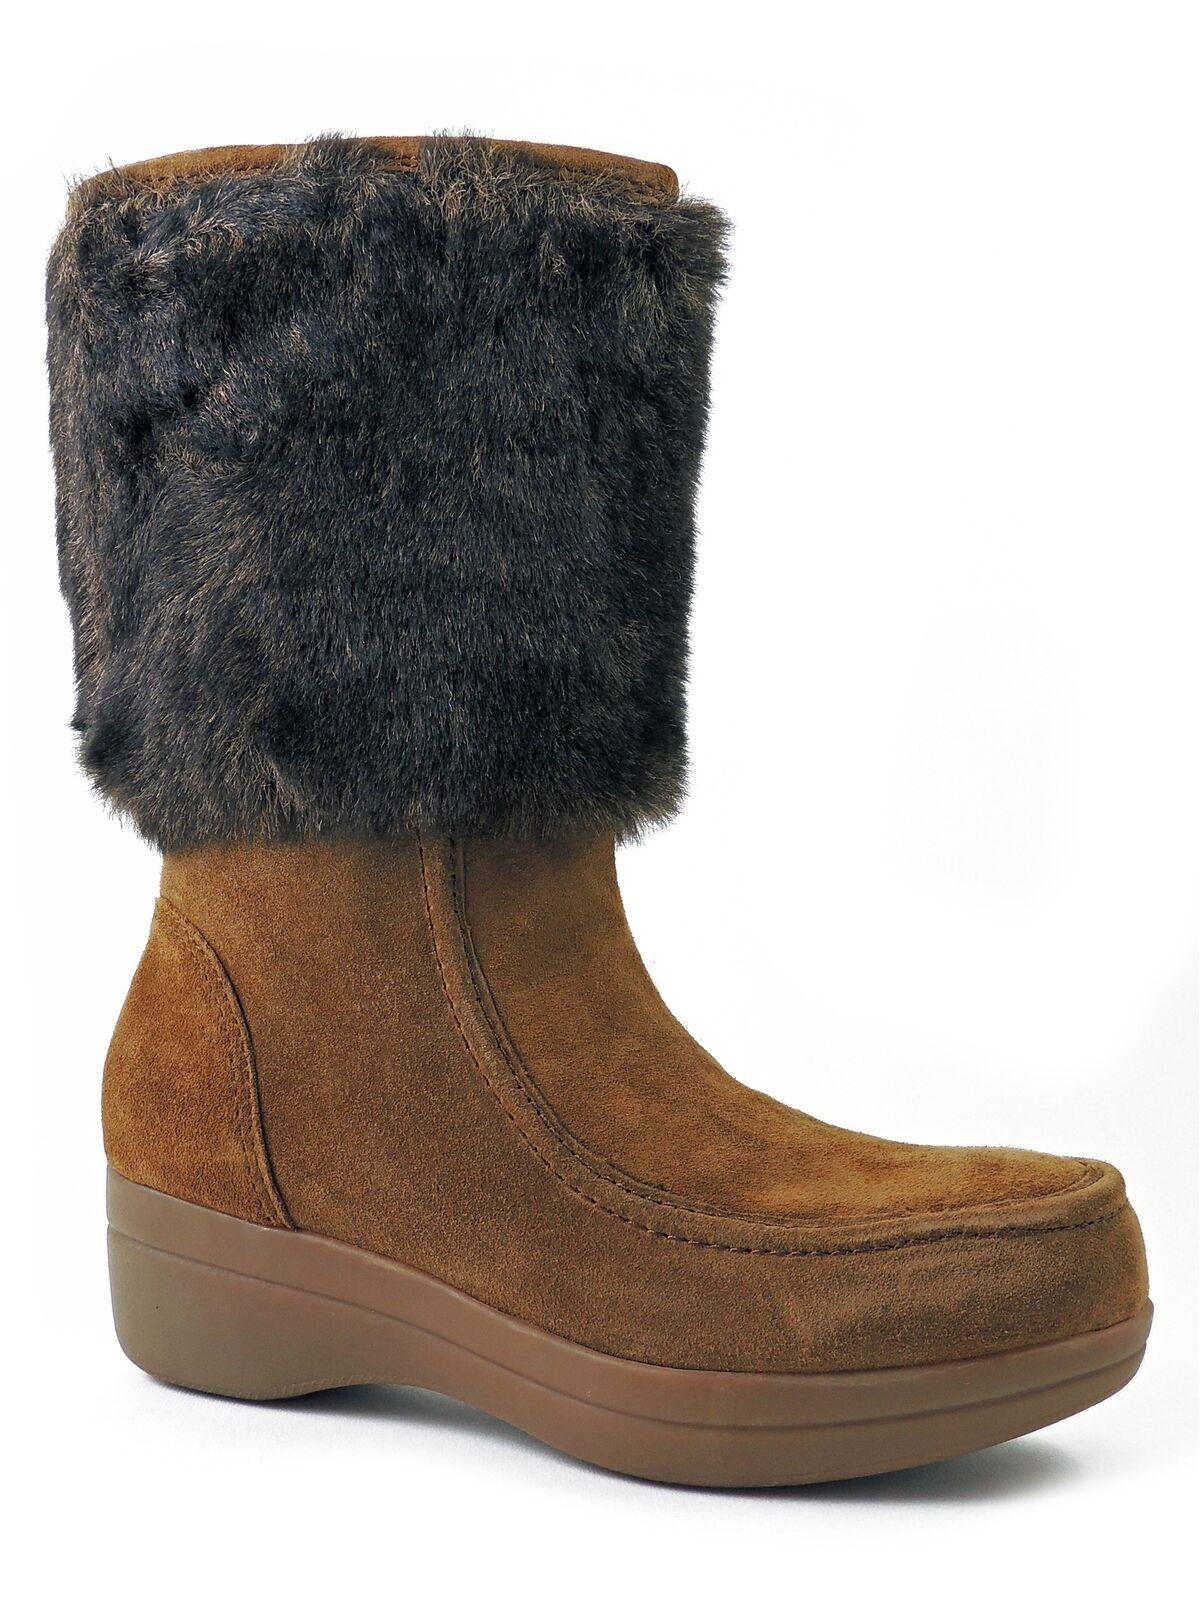 ENZO Angiolini para mujer botas Invierno Nieve Nieve Nieve Pegasi, natural MU Gamuza Talla 6 M  suministro directo de los fabricantes